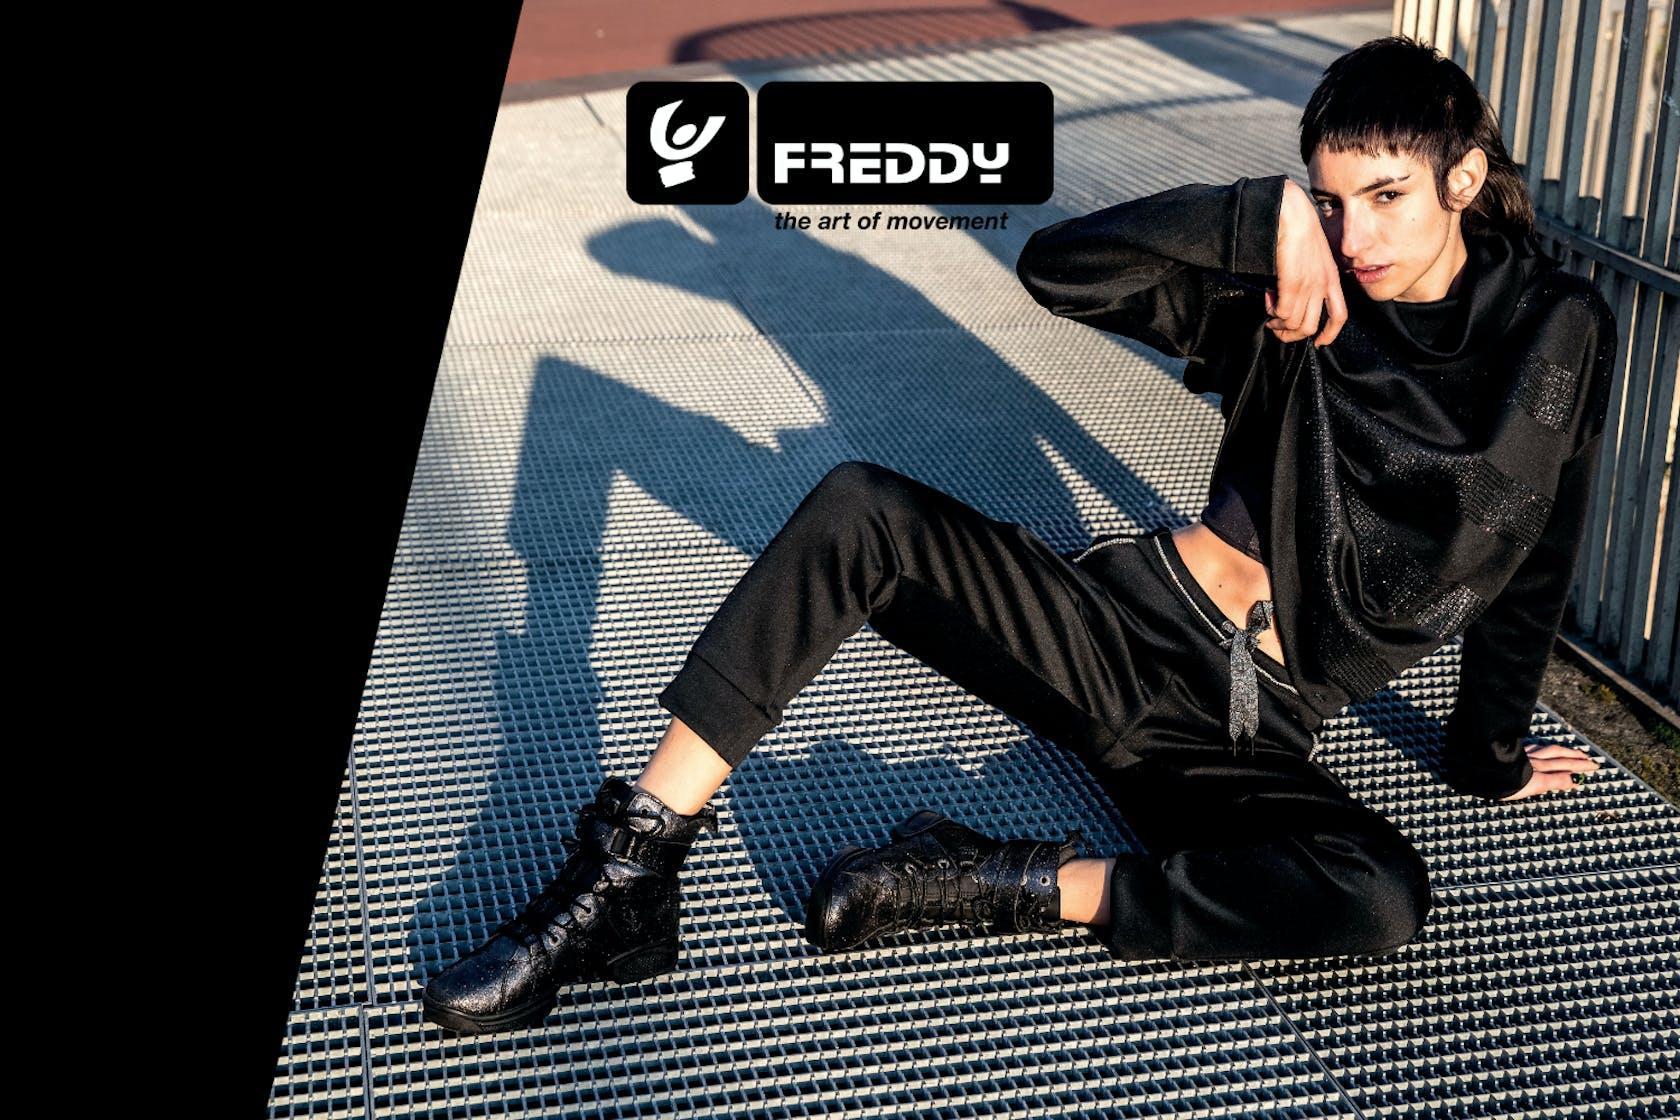 Freddy shop online abbigliamento fitness